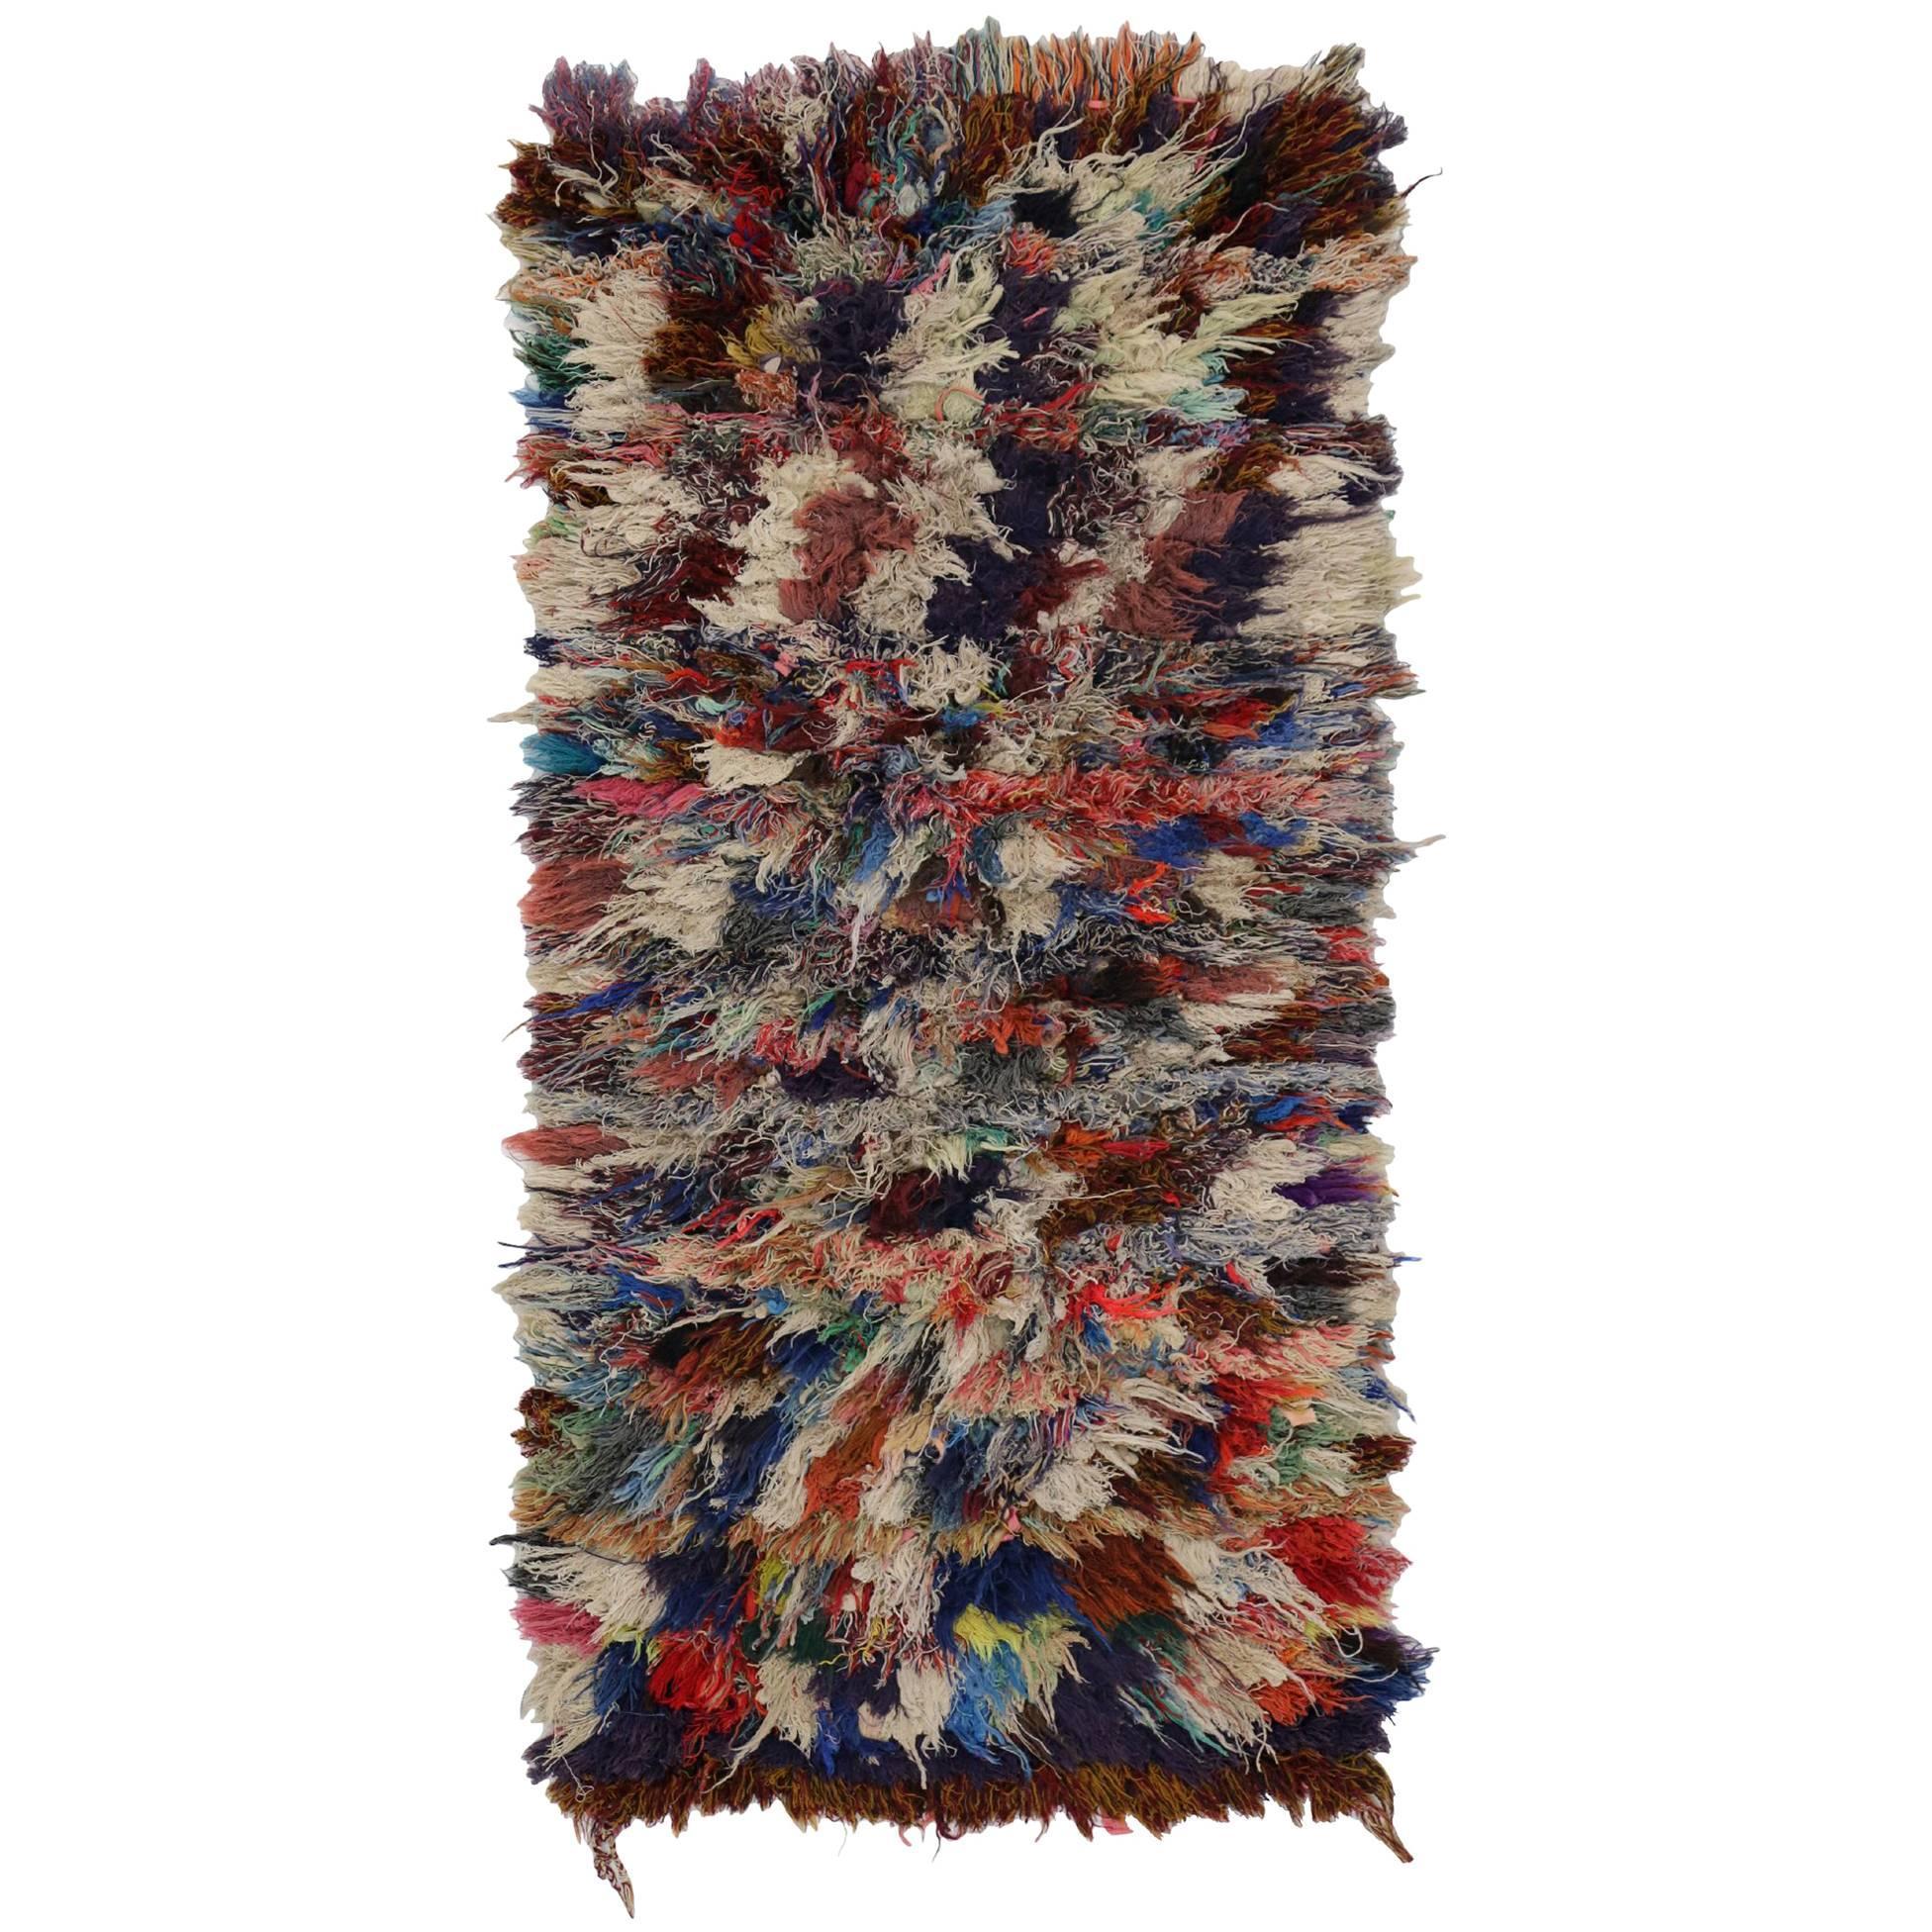 Vintage Berber Moroccan Boucherouite Rug, Moroccan Shag Accent Rug